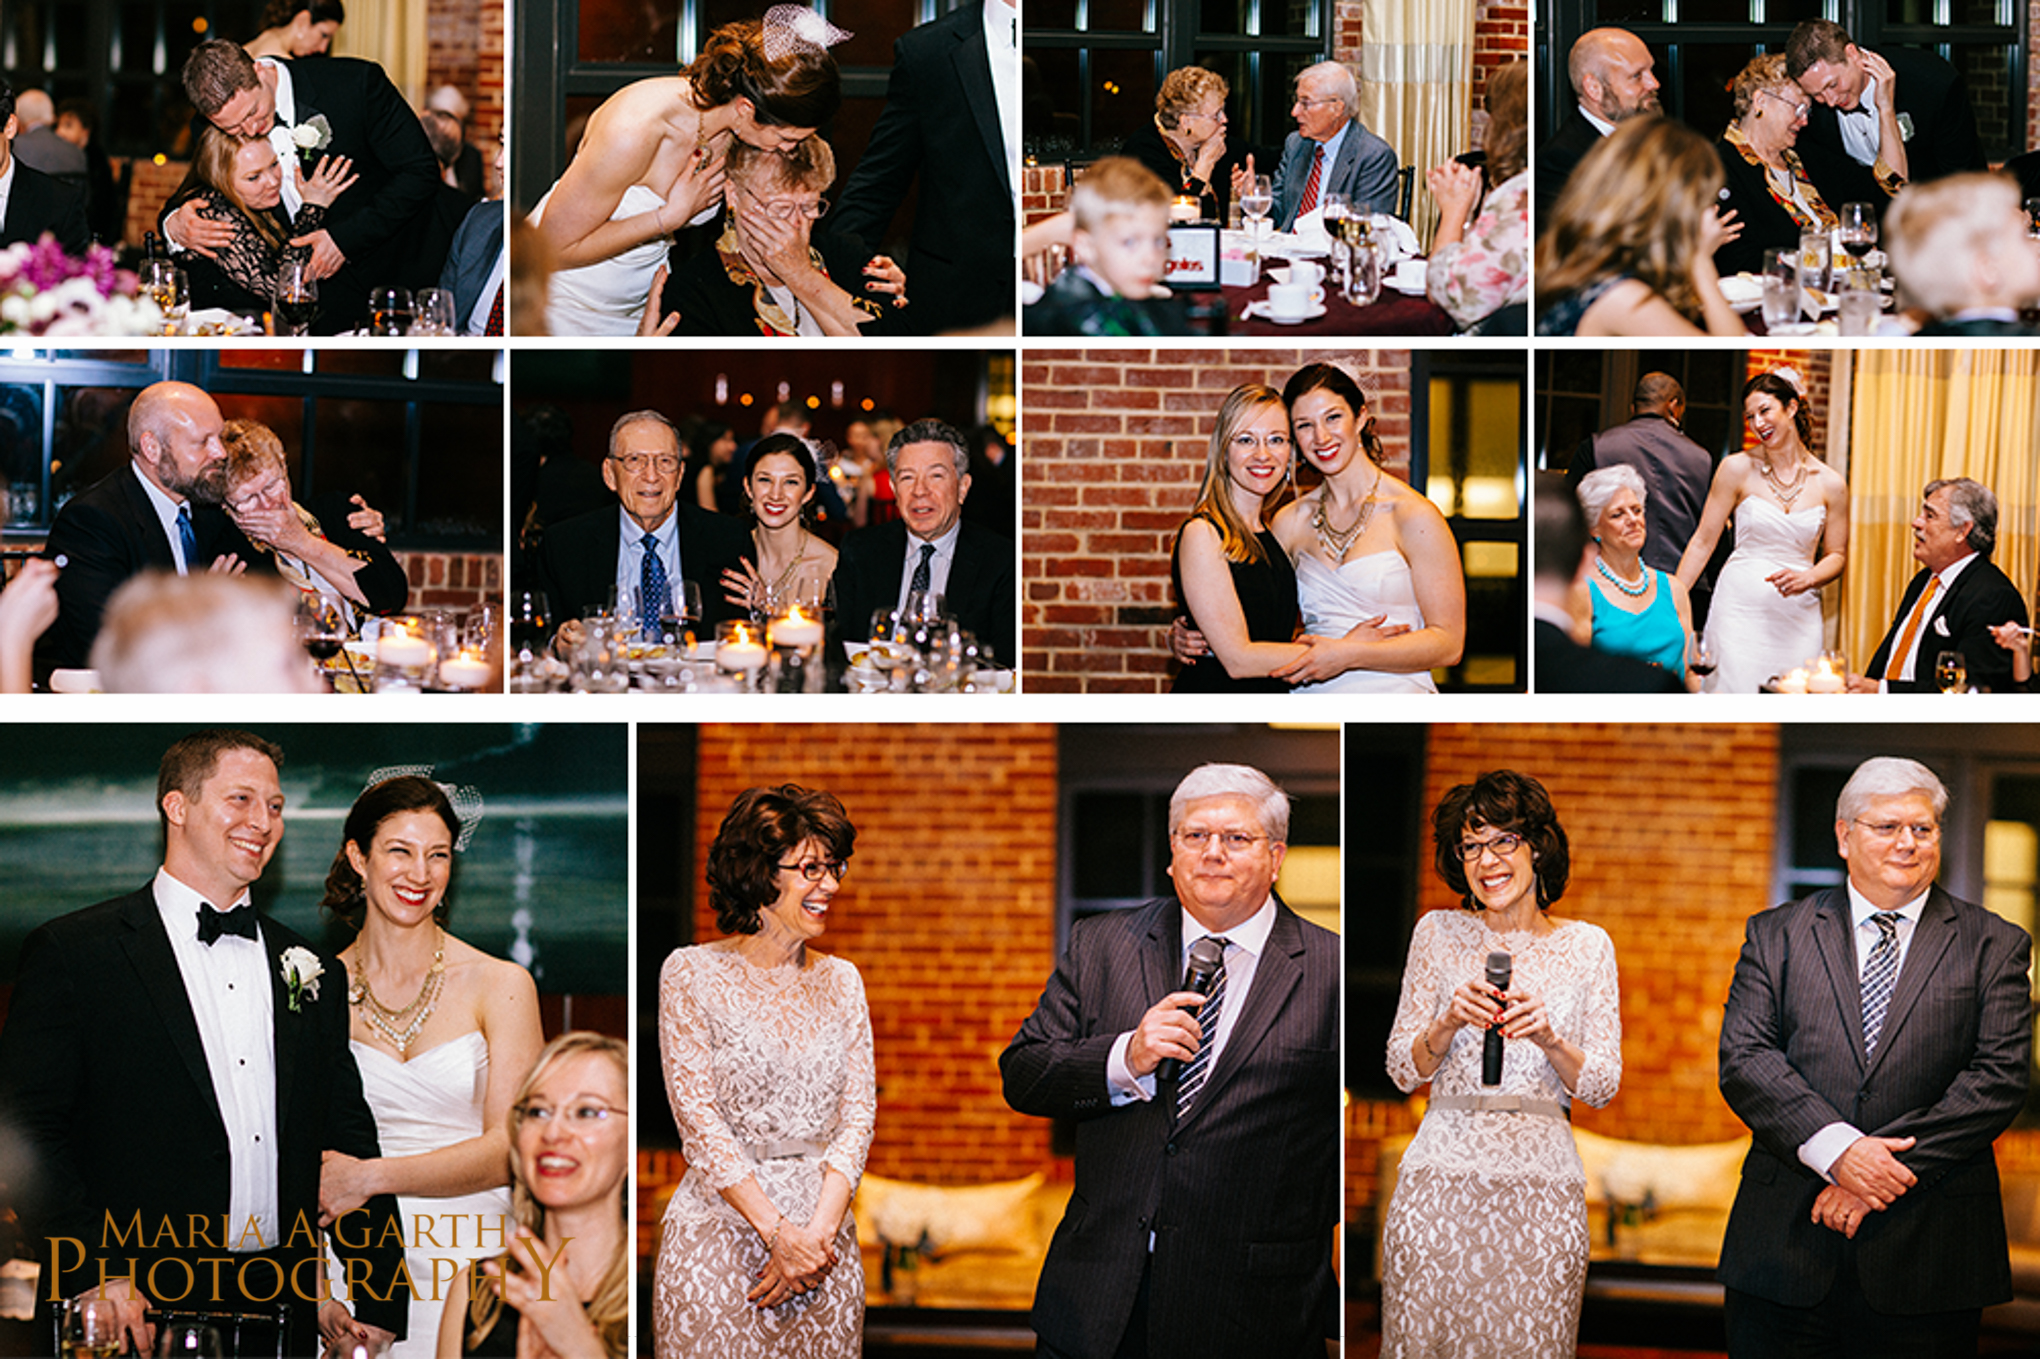 Georgetown Weddings, DC Wedding Photography, Weddings at the Ritz in DC_024.jpg